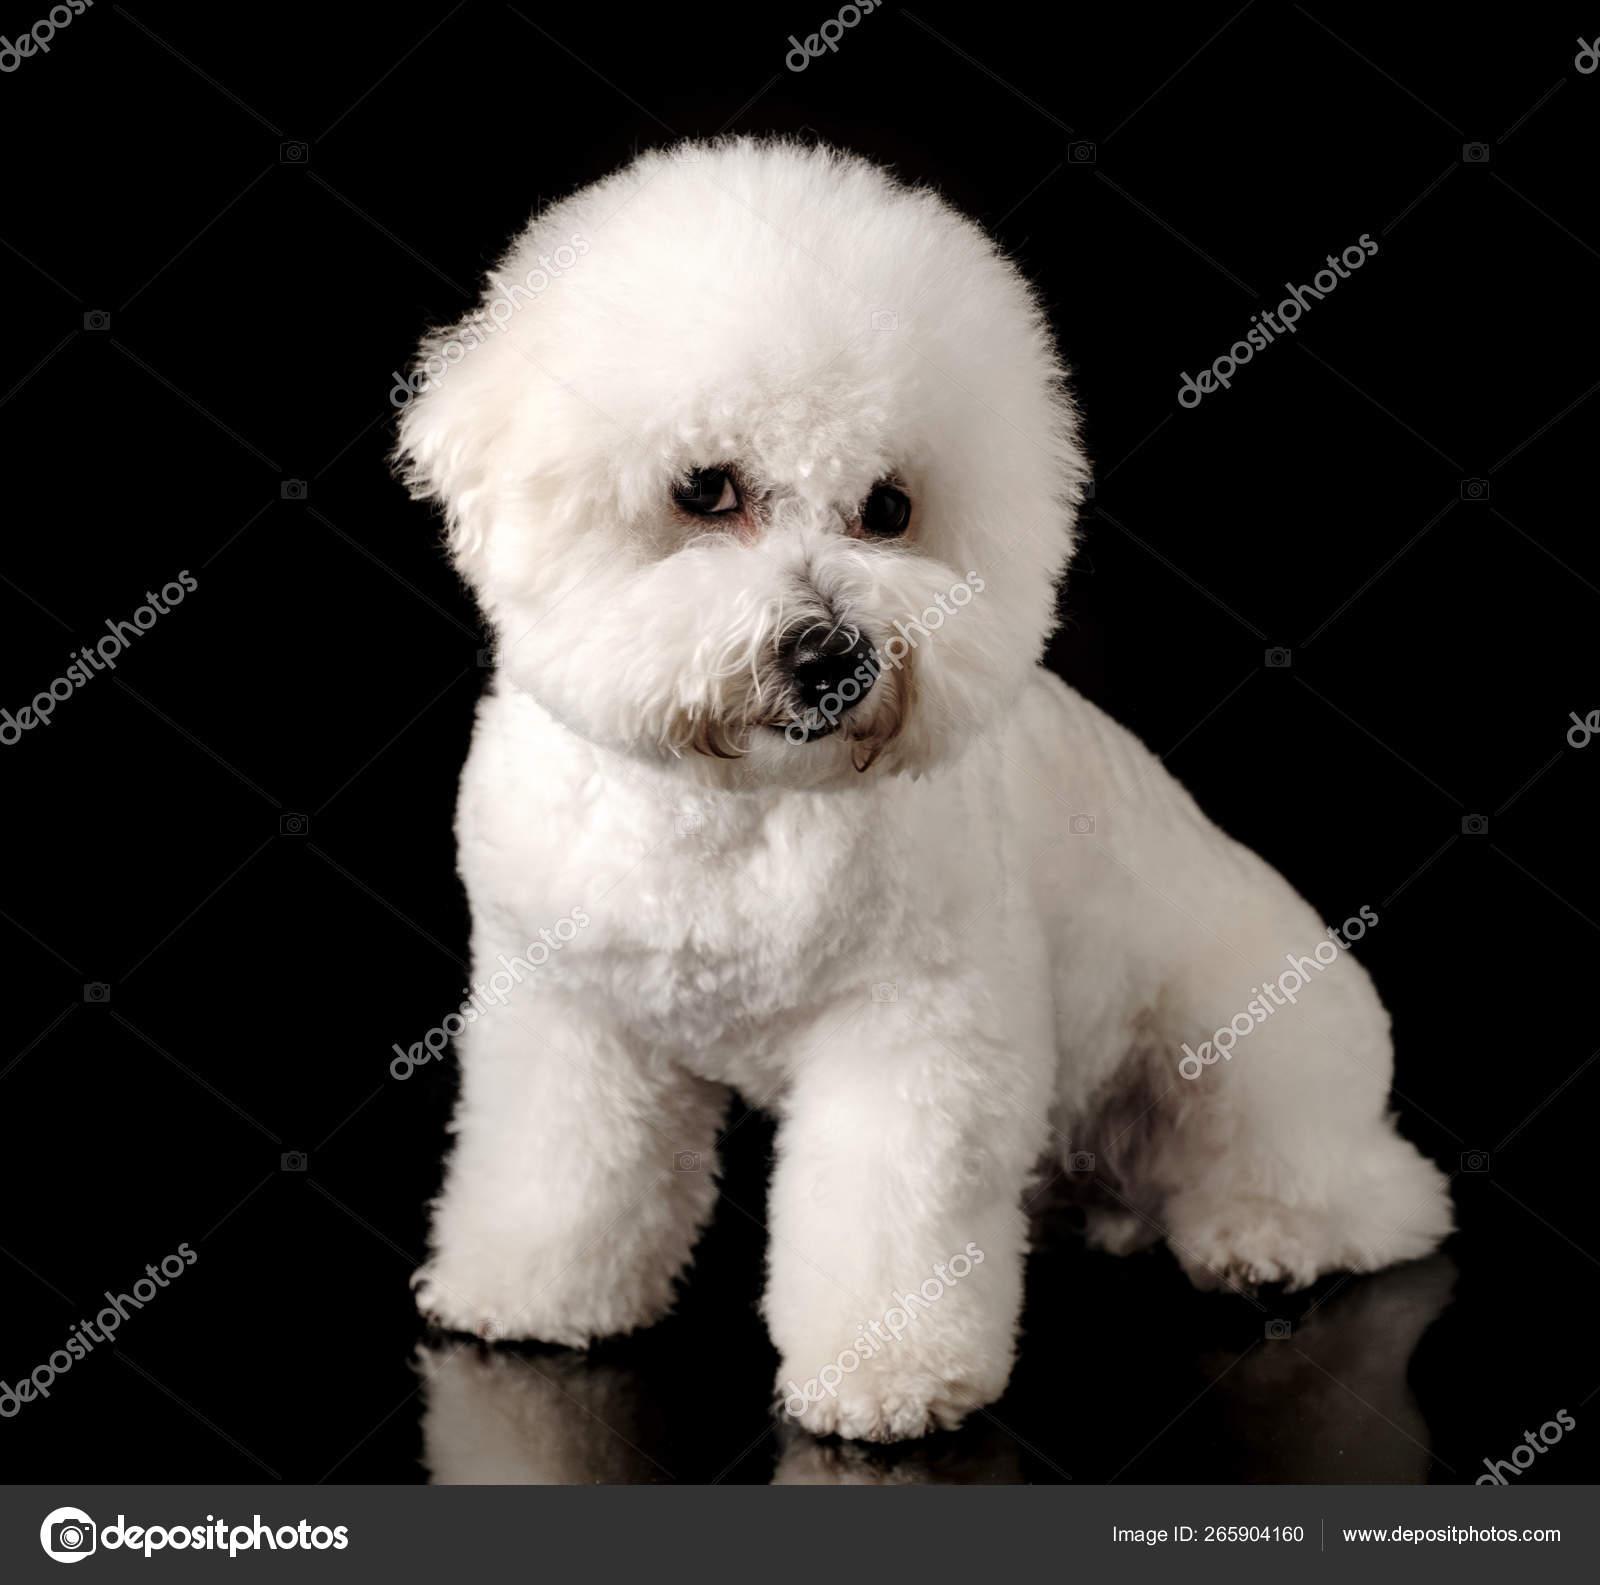 Bichon Isolated Black Background Bichon Frise Puppy White Dog Bichon Stock Photo C Fotoatelie 265904160